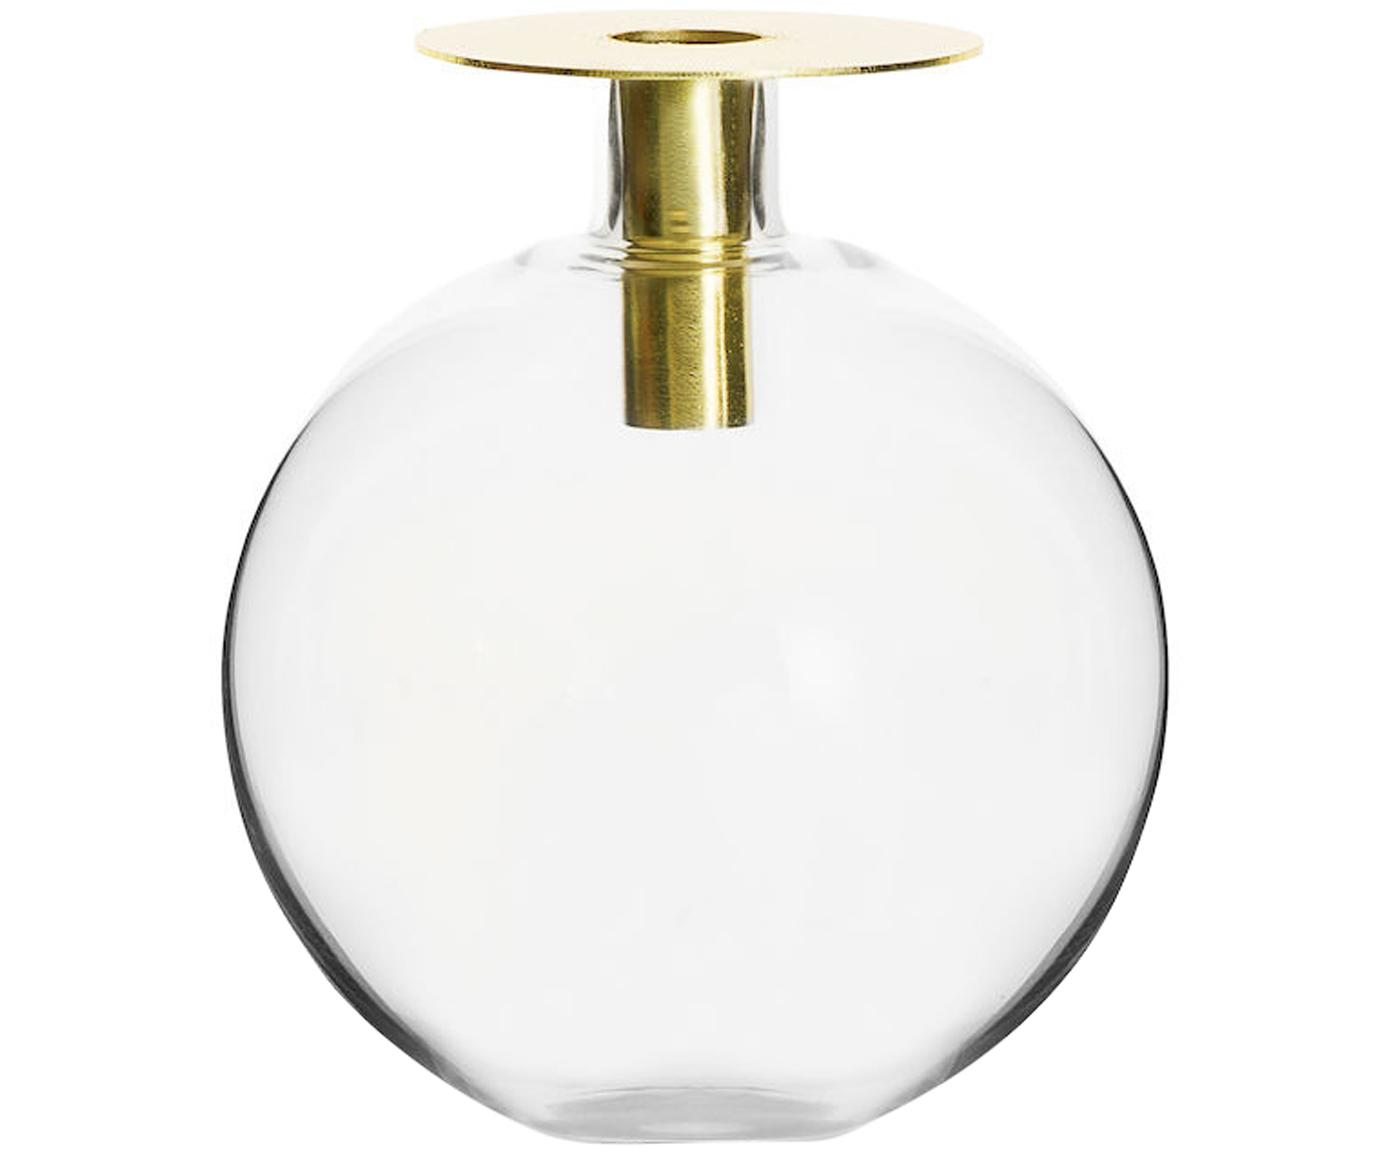 Jarrón Aniela, Metal, vidrio, Dorado, transparente, Ø 14 x Al 18 cm